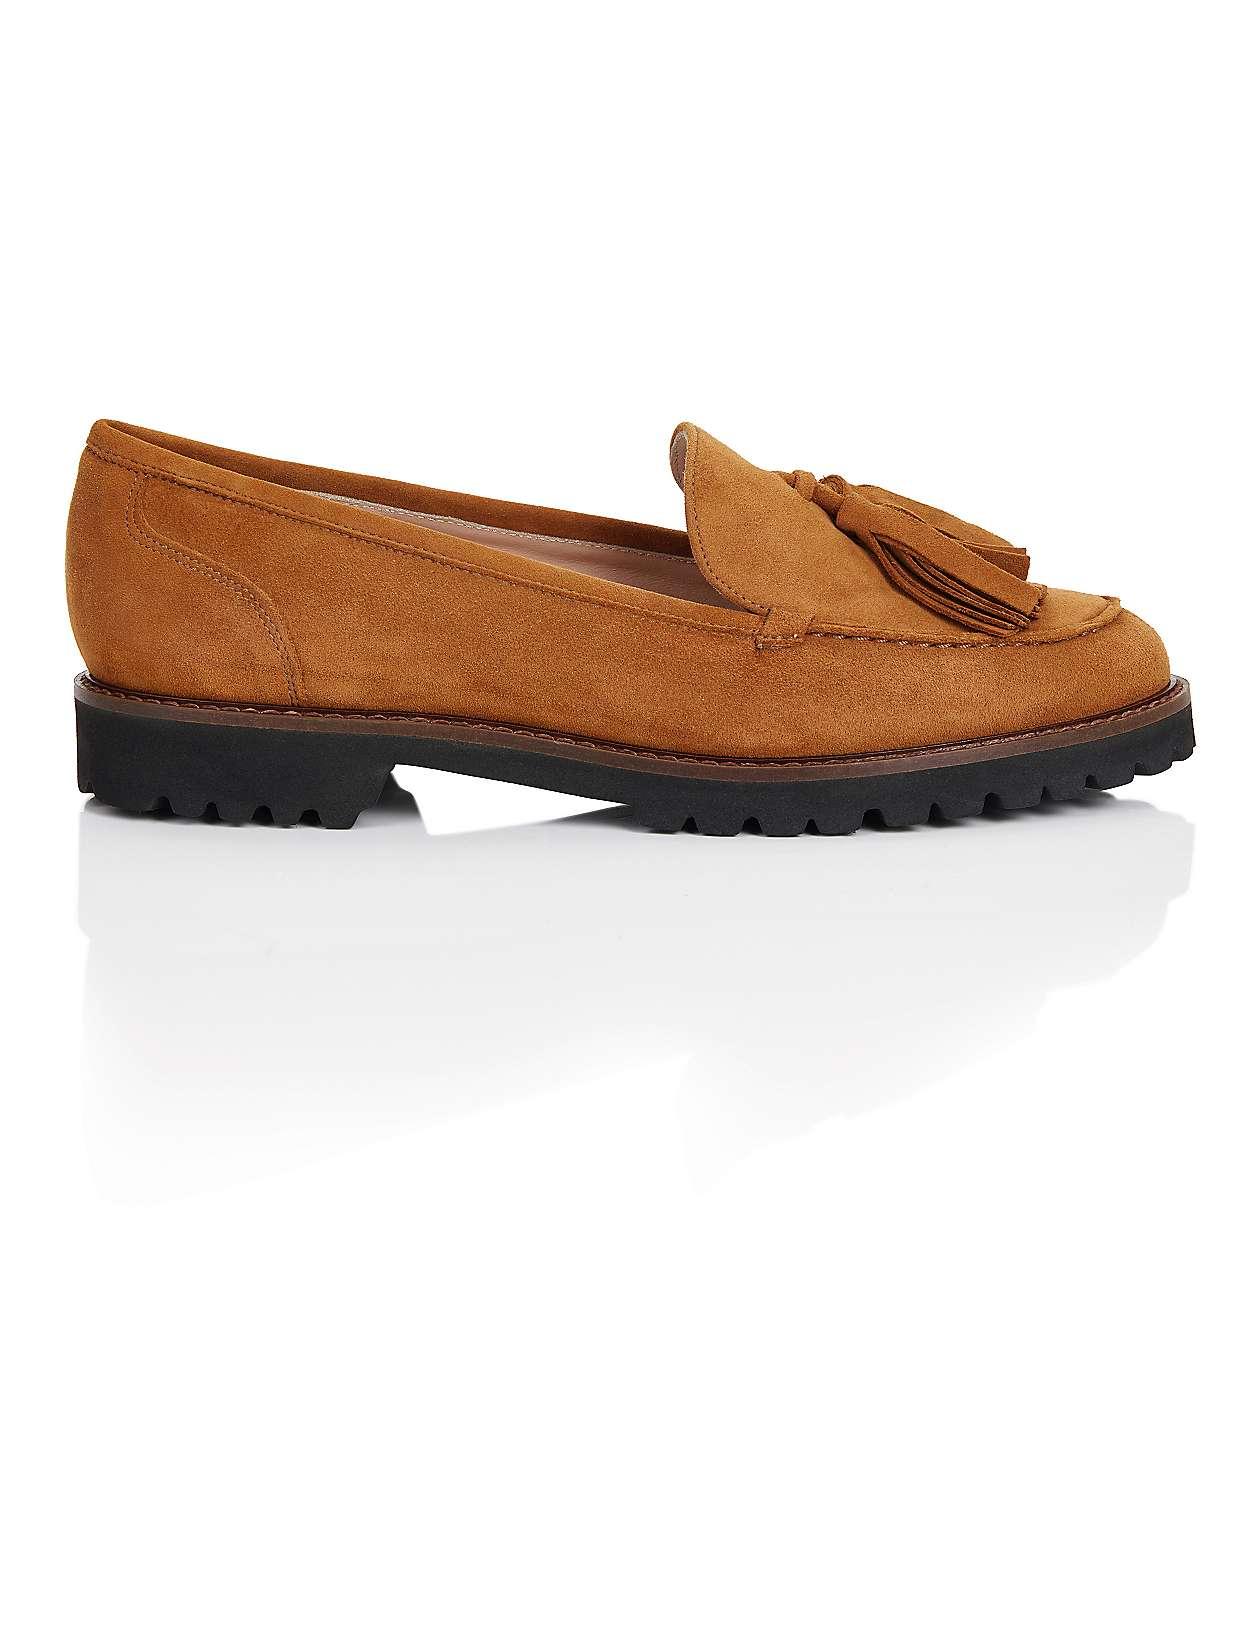 59de5c7eb47f9 Schuhe   MADELEINE Mode Schweiz